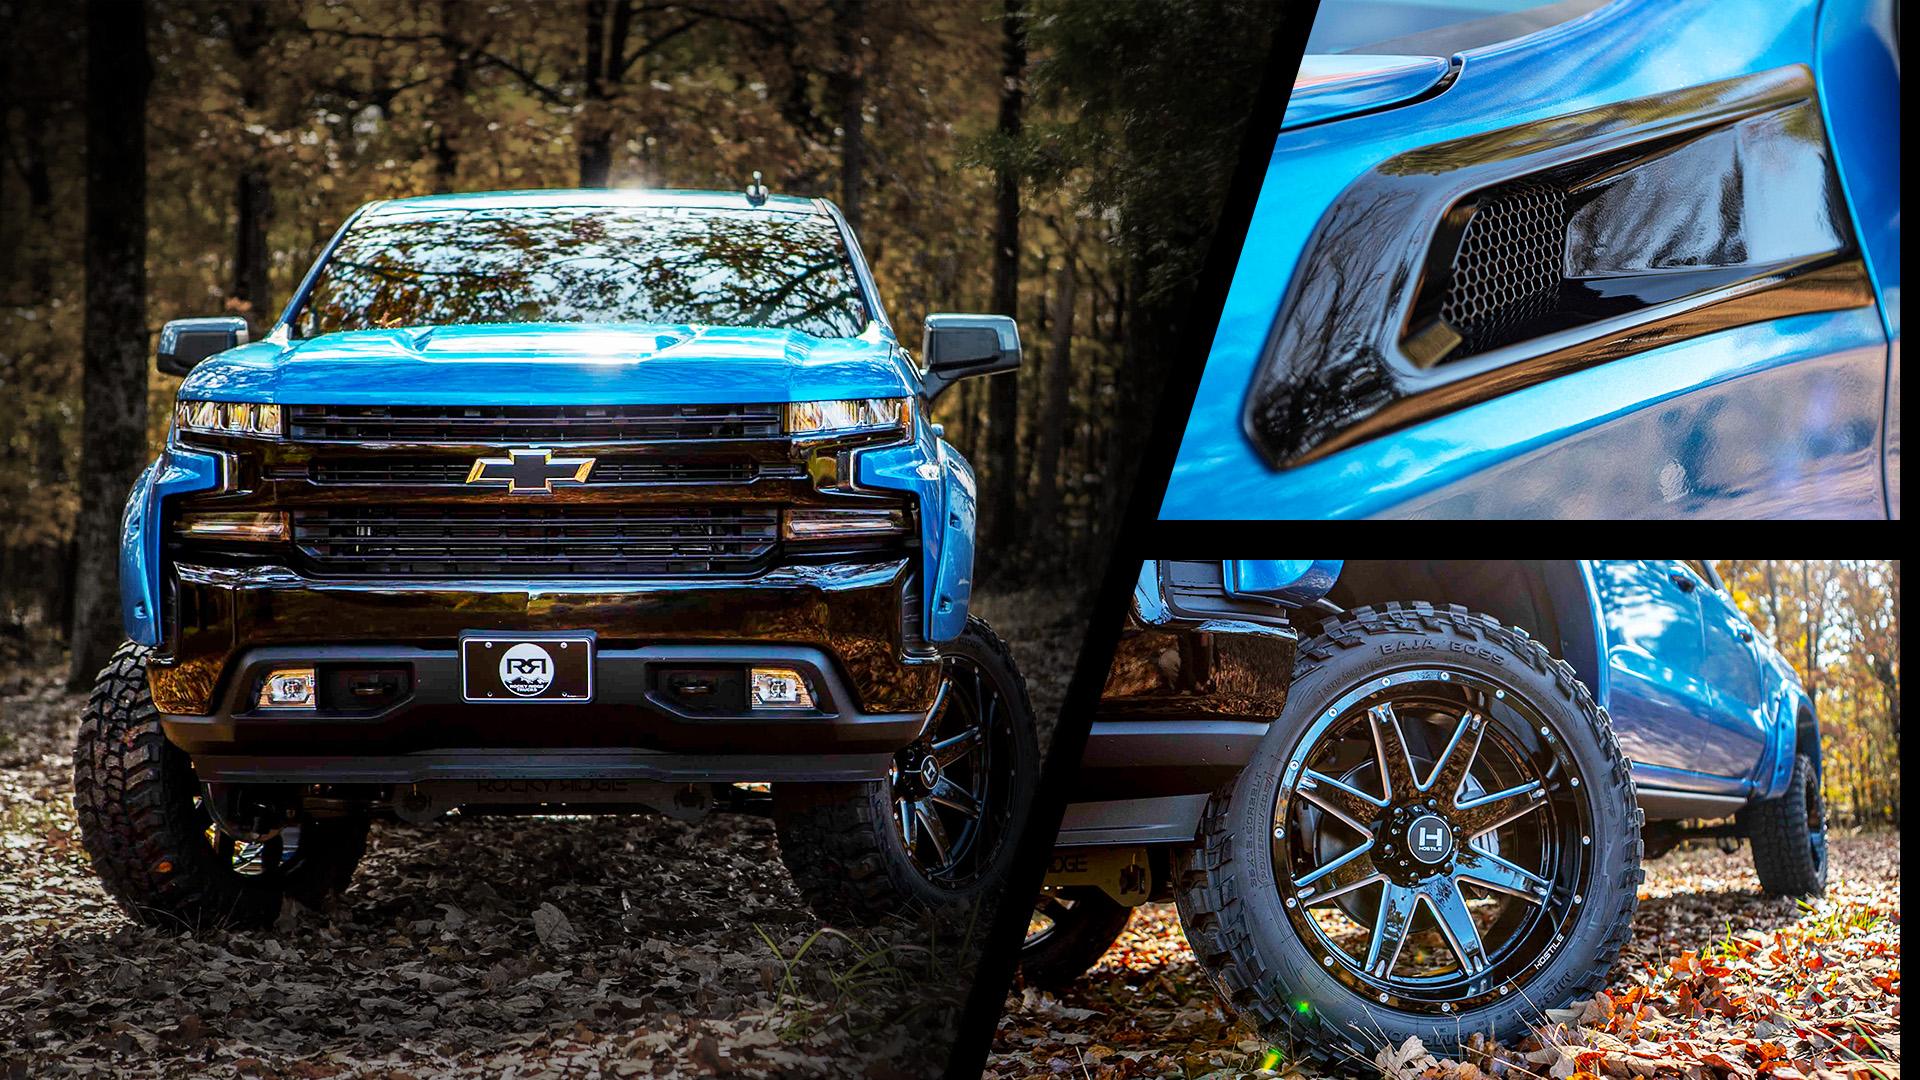 Rocky Ridge Special Edition Lifted Chevrolet K2 Rocky Ridge Trucks